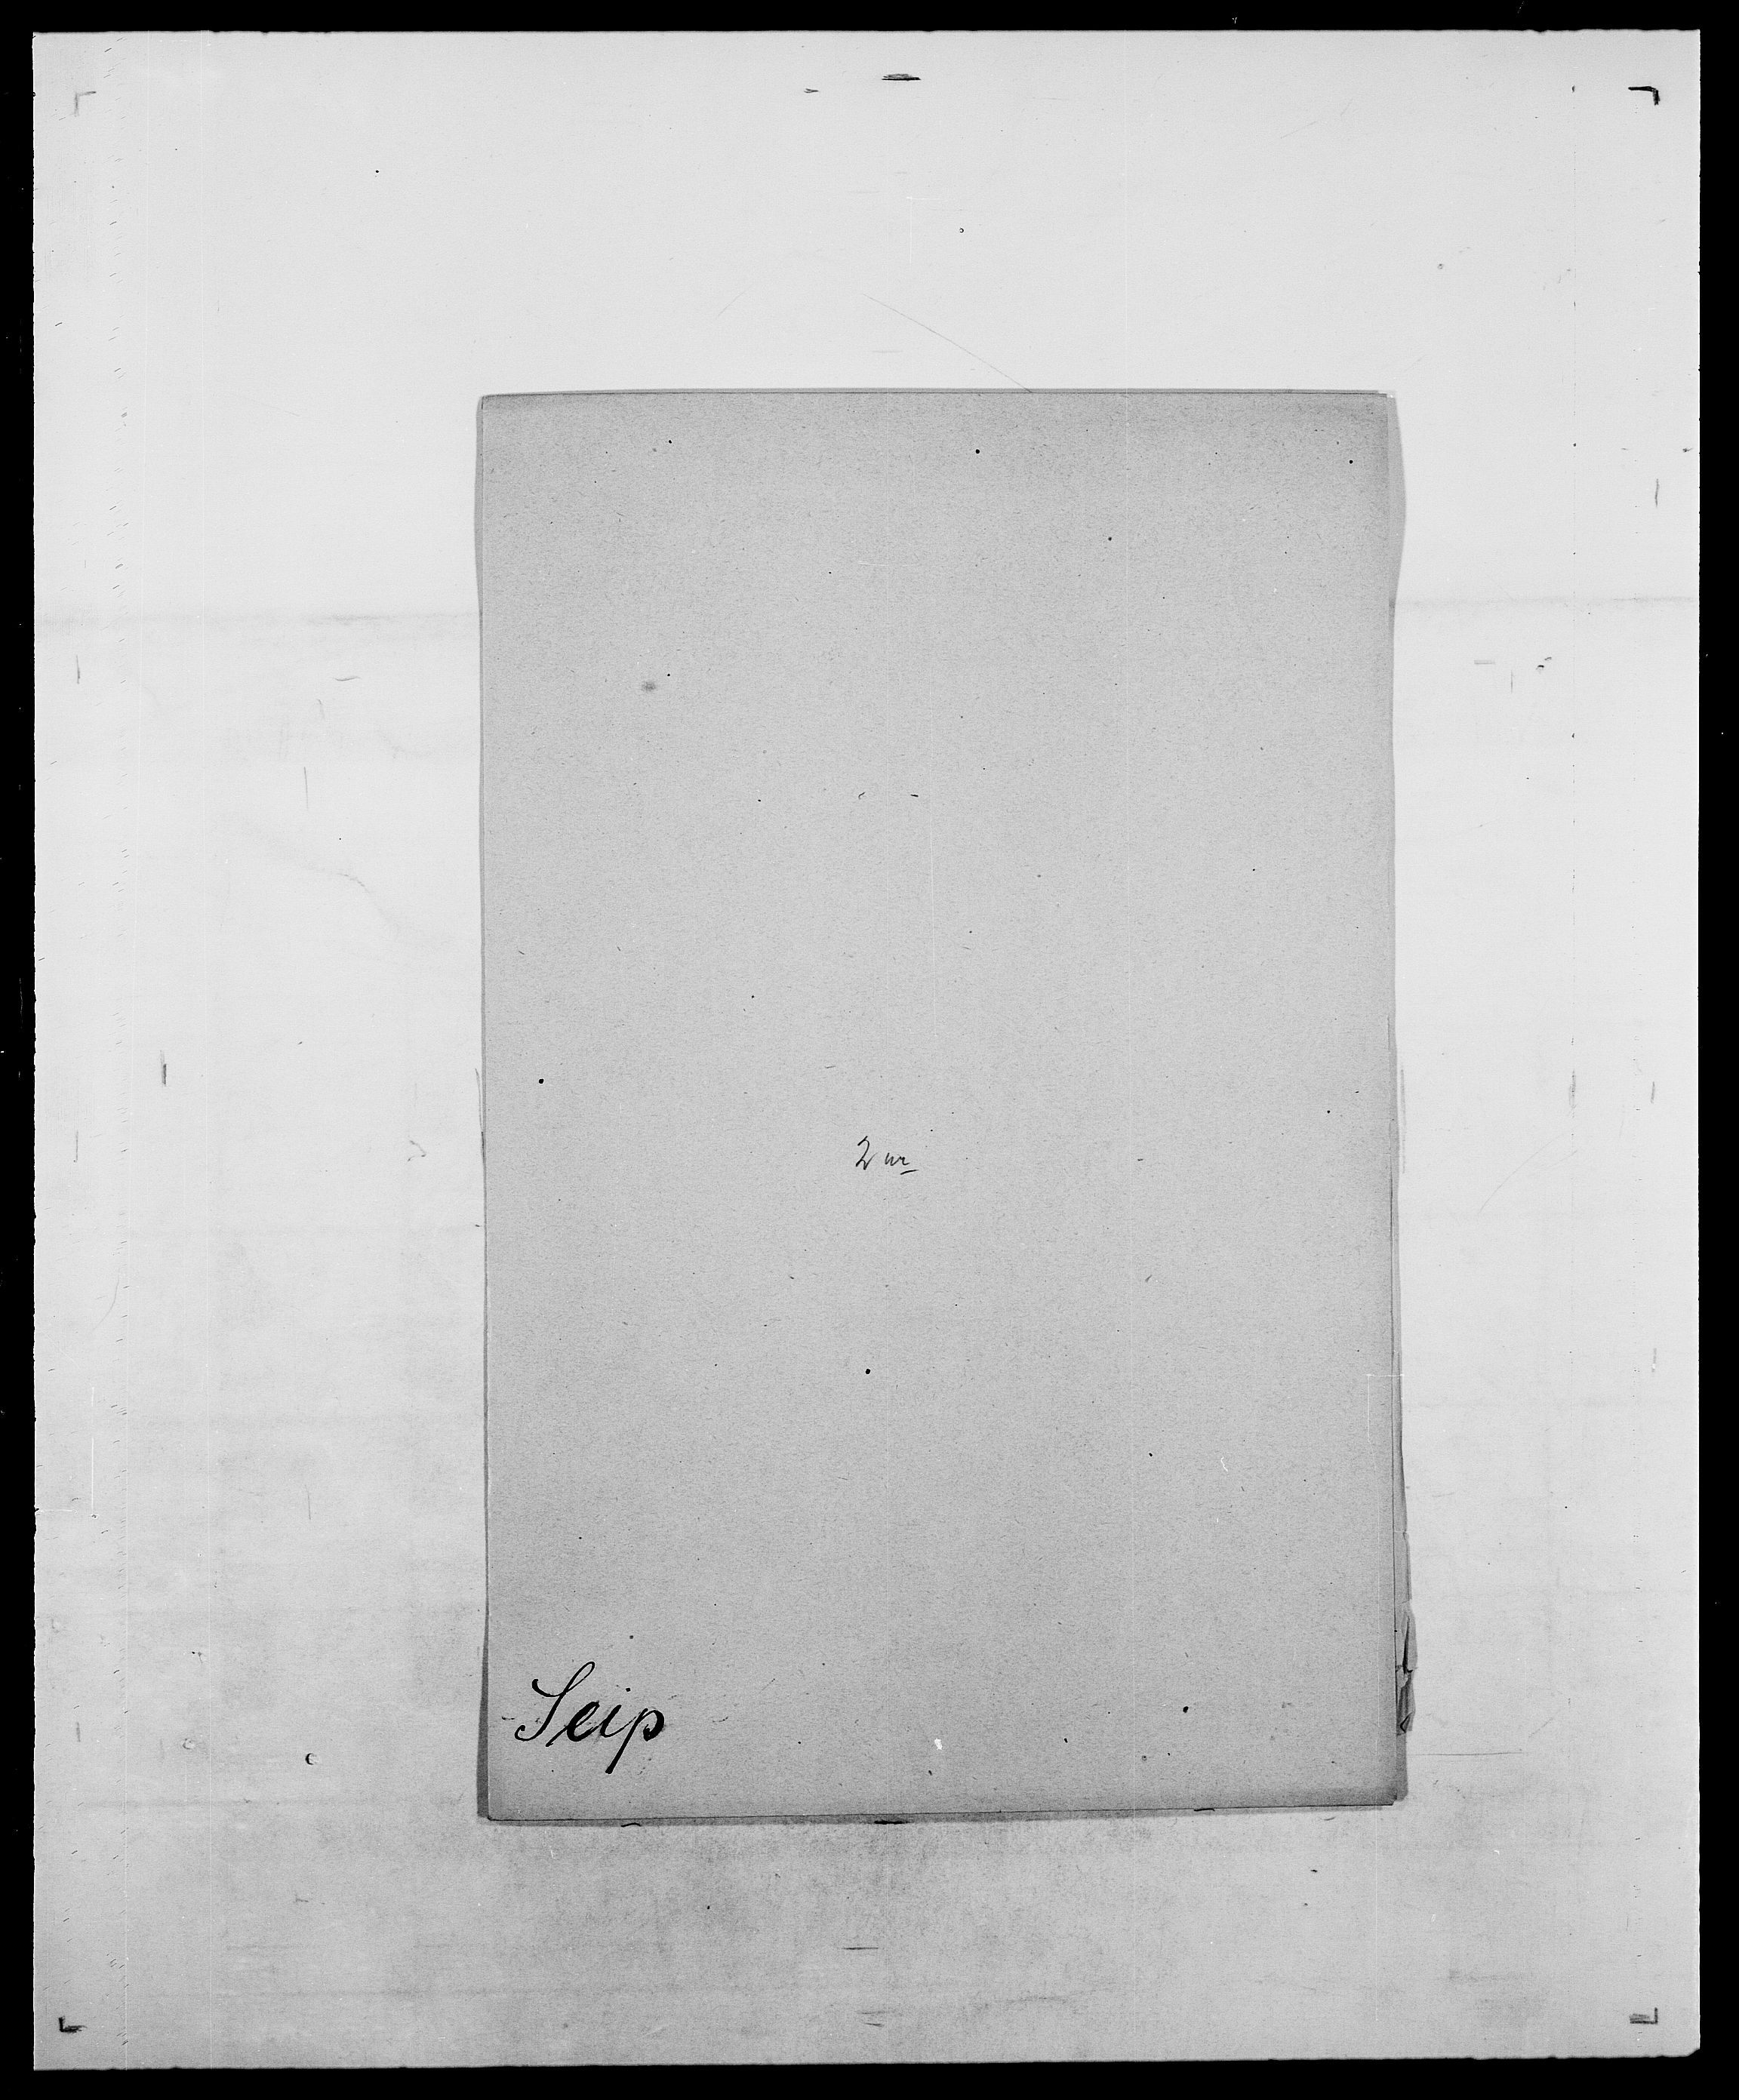 SAO, Delgobe, Charles Antoine - samling, D/Da/L0035: Schnabel - sjetman, s. 609